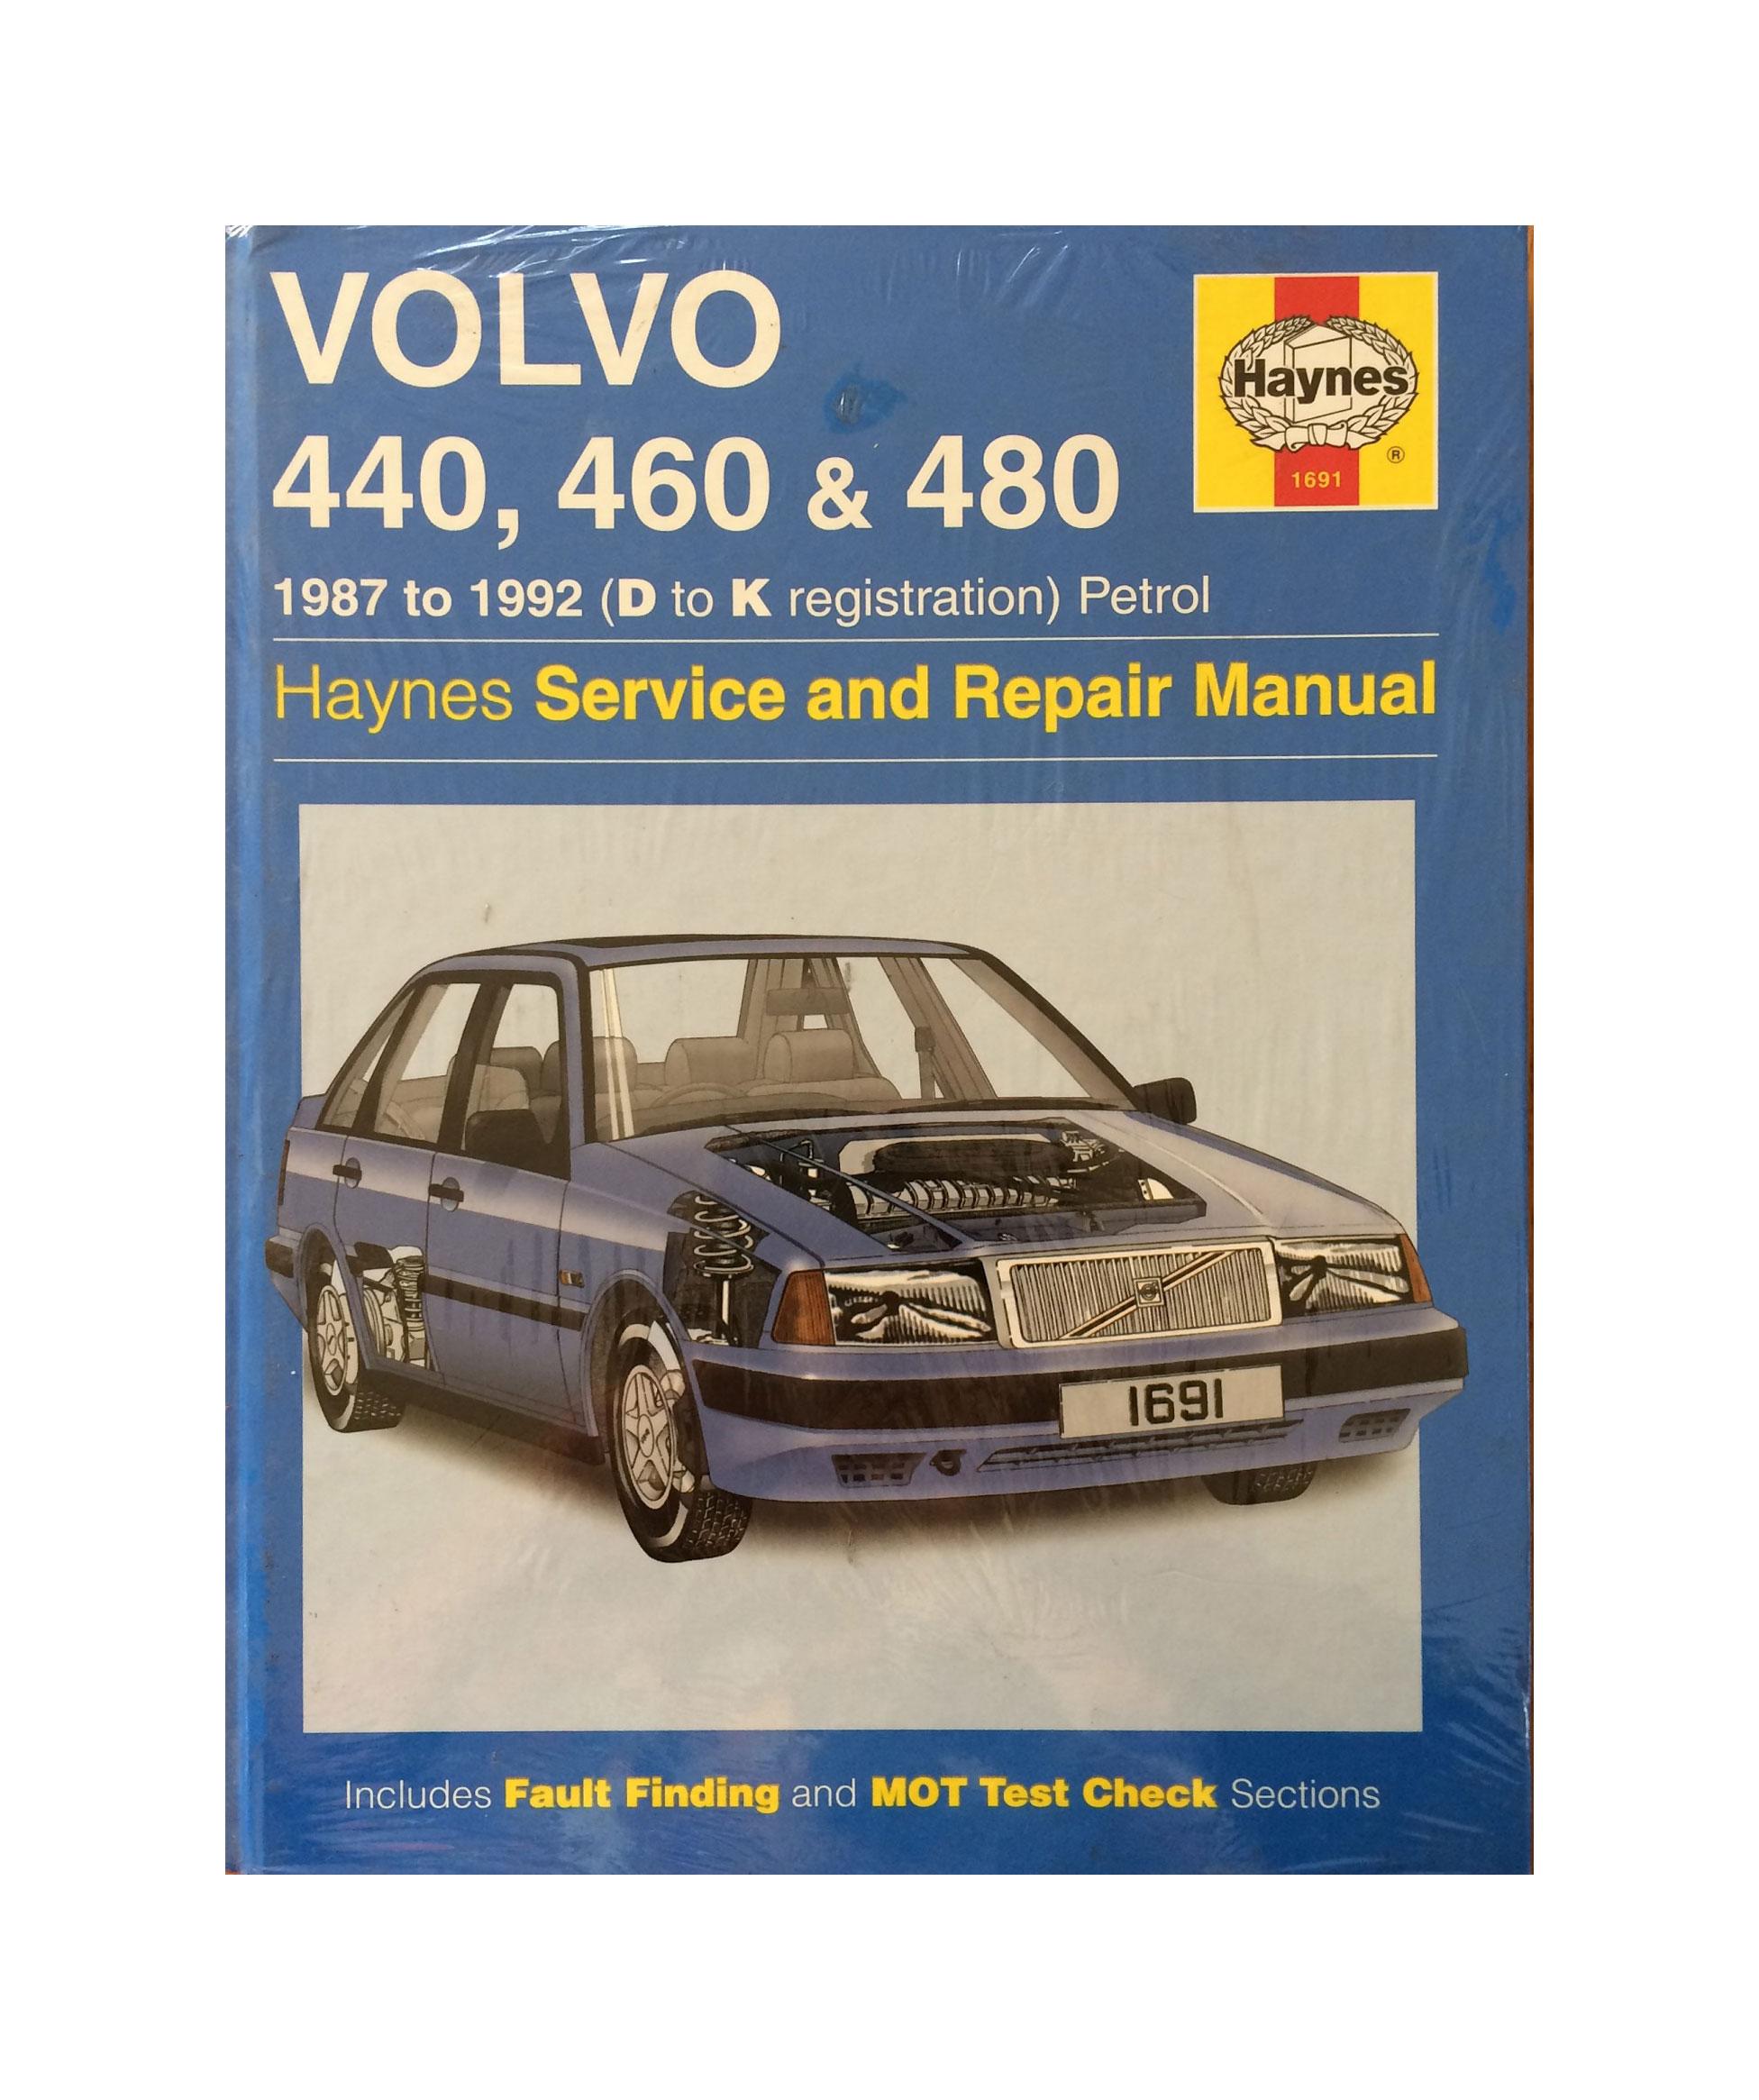 Volvo 440, 460, 480 D-K reg Petrol – Haynes Service & Repair Manual